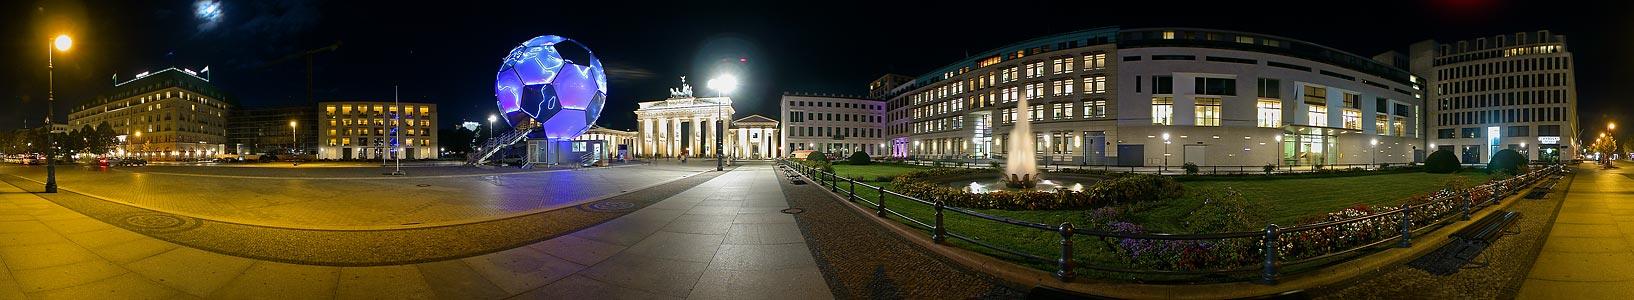 Fußballglobus Berlin, Pariser Platz